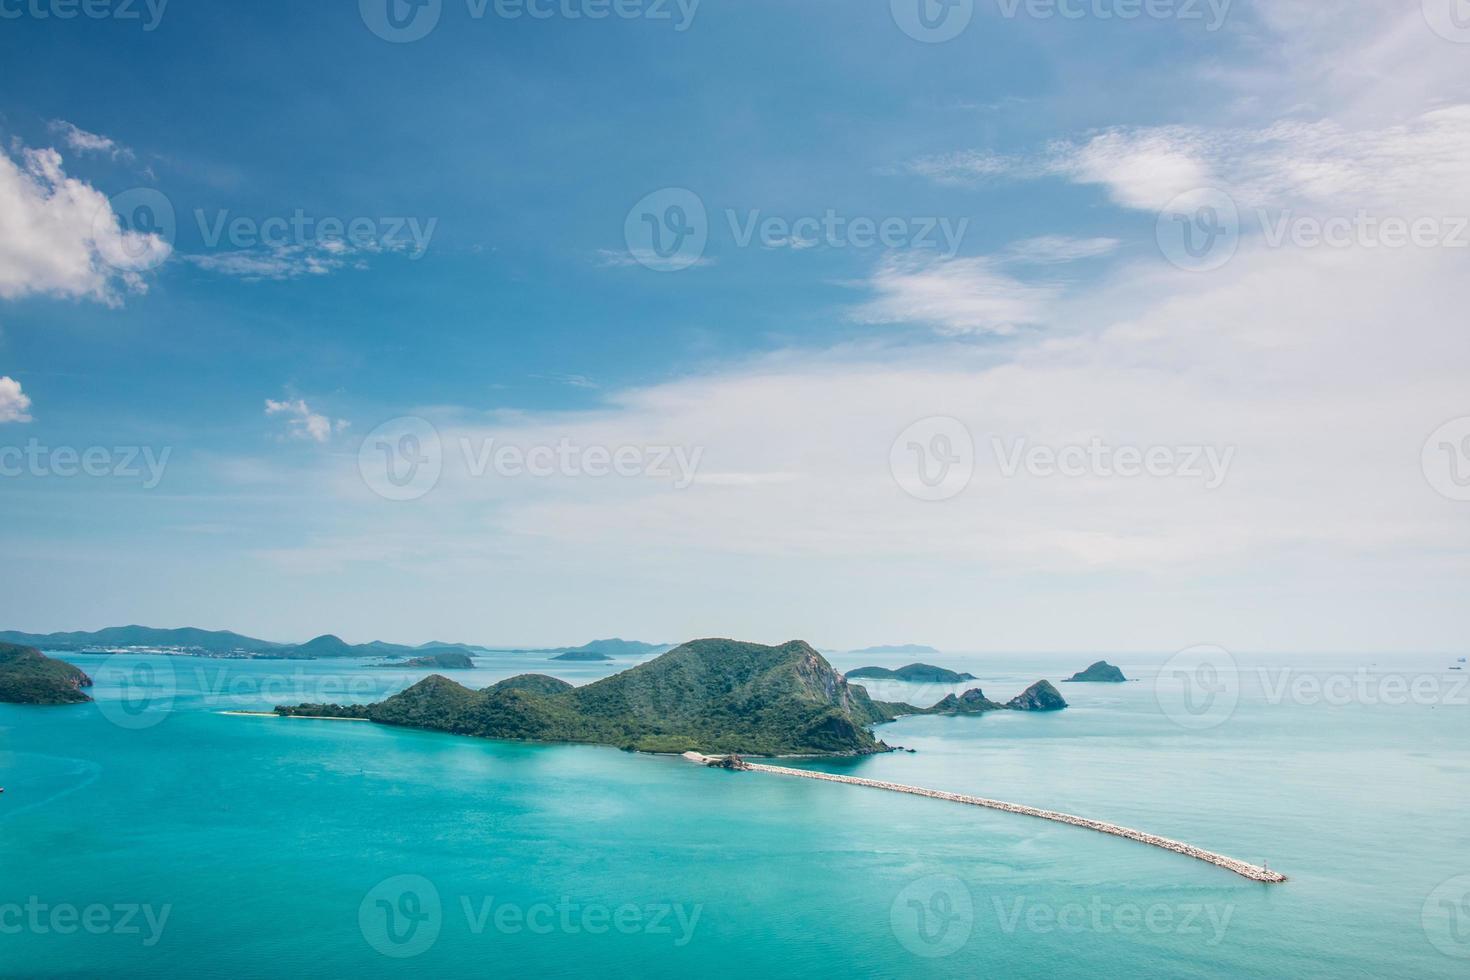 Mar hermoso. Golfo de Tailandia, foto